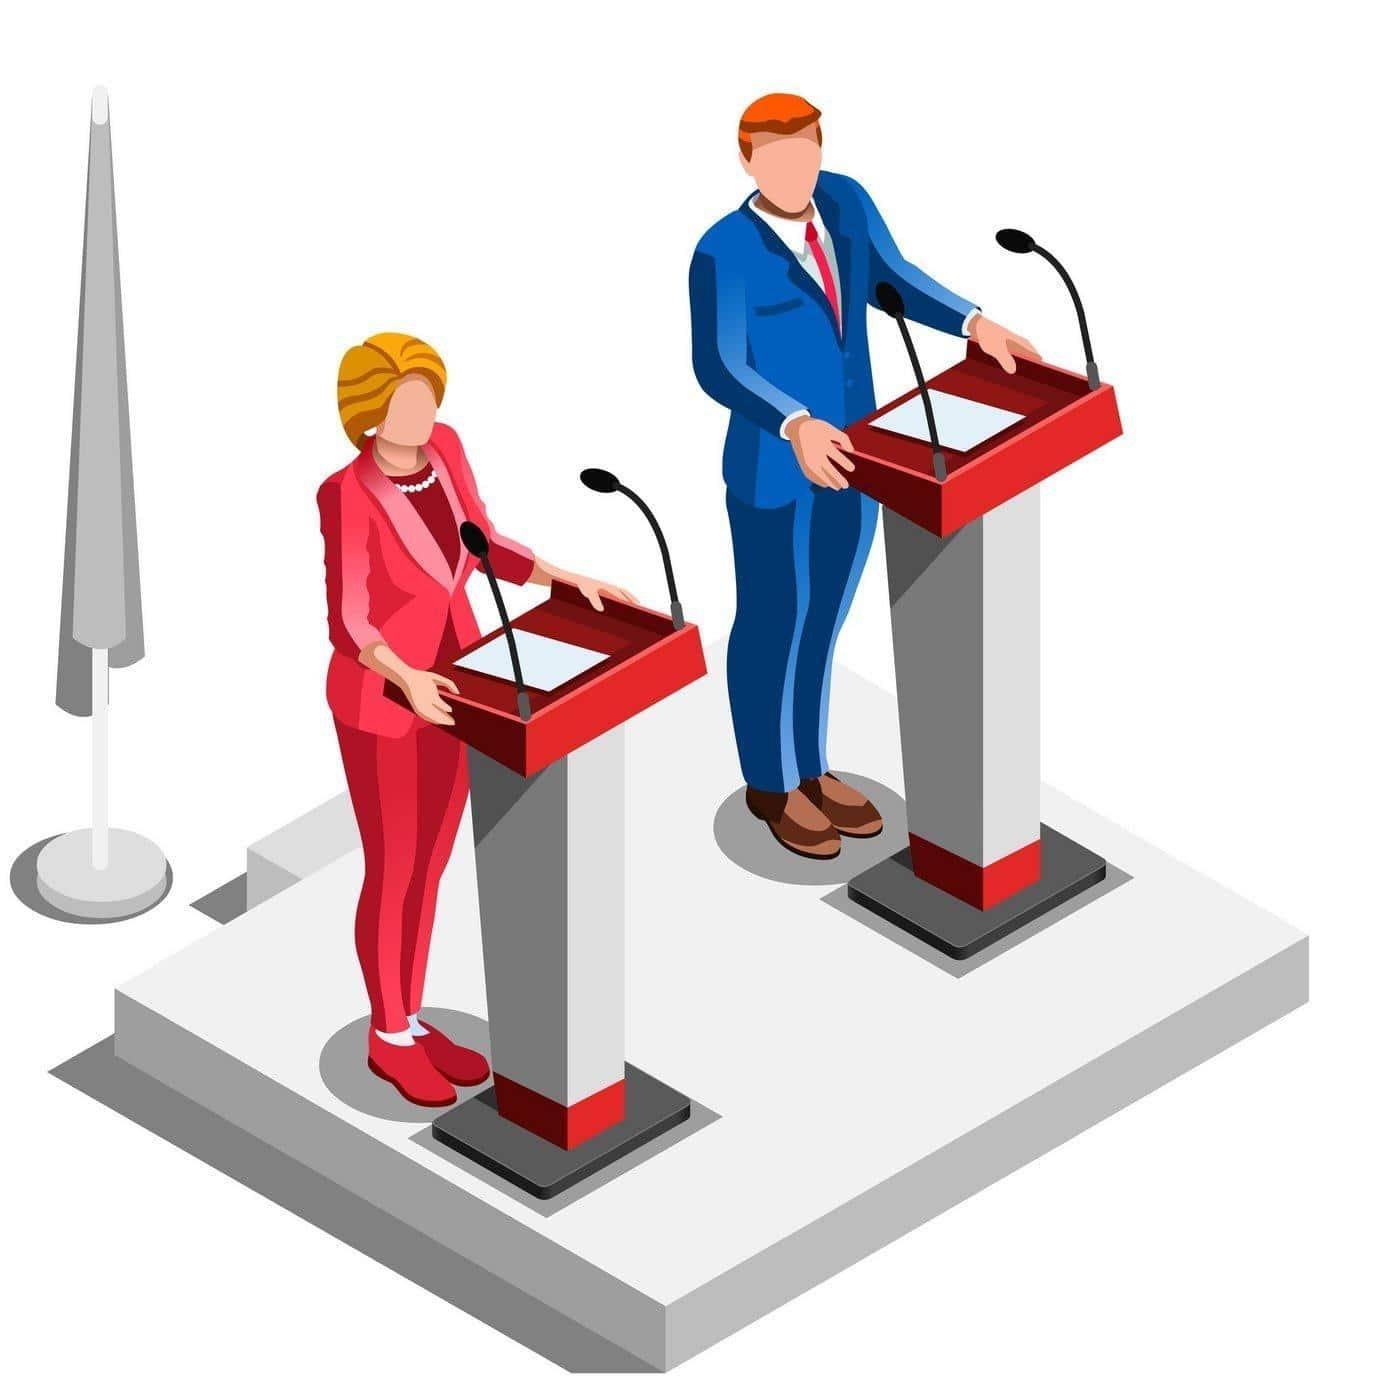 AIS Presidential Debate Copier Supplier Image